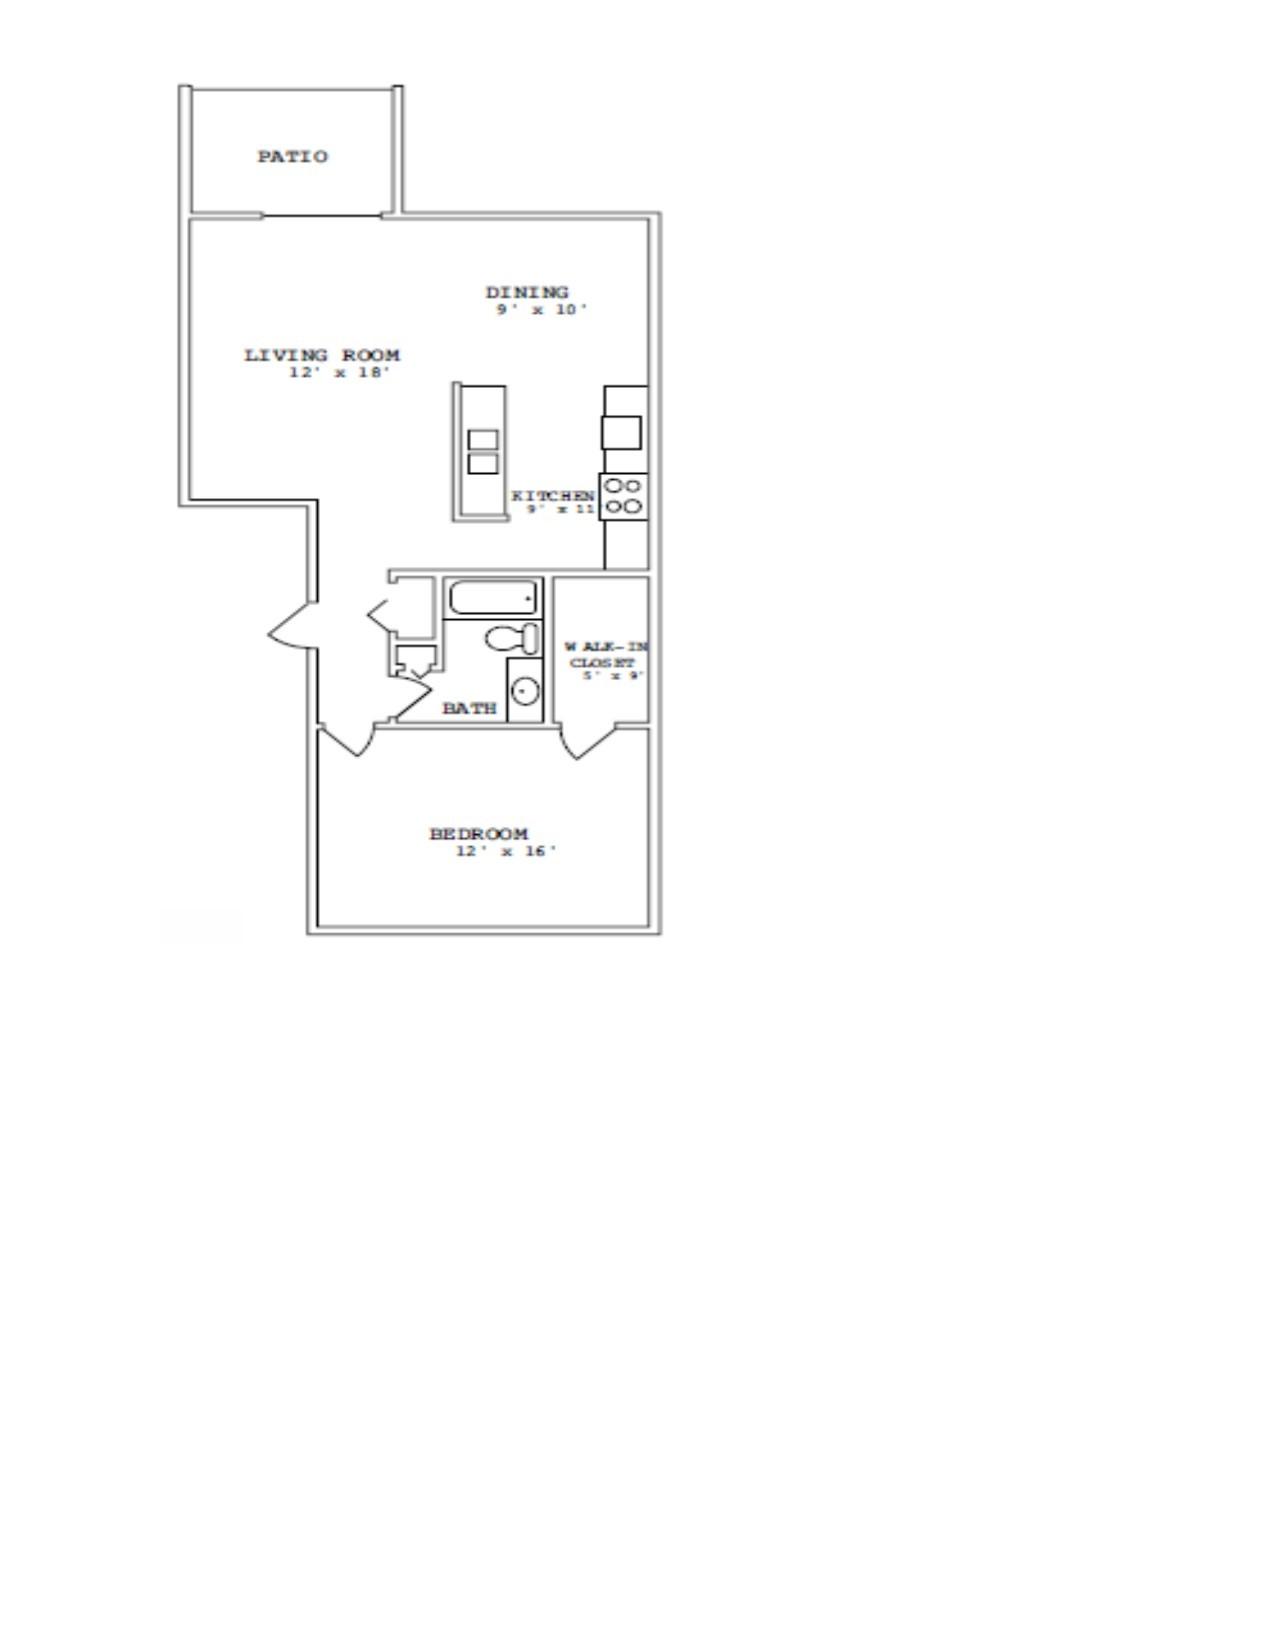 890-04 Floorplan